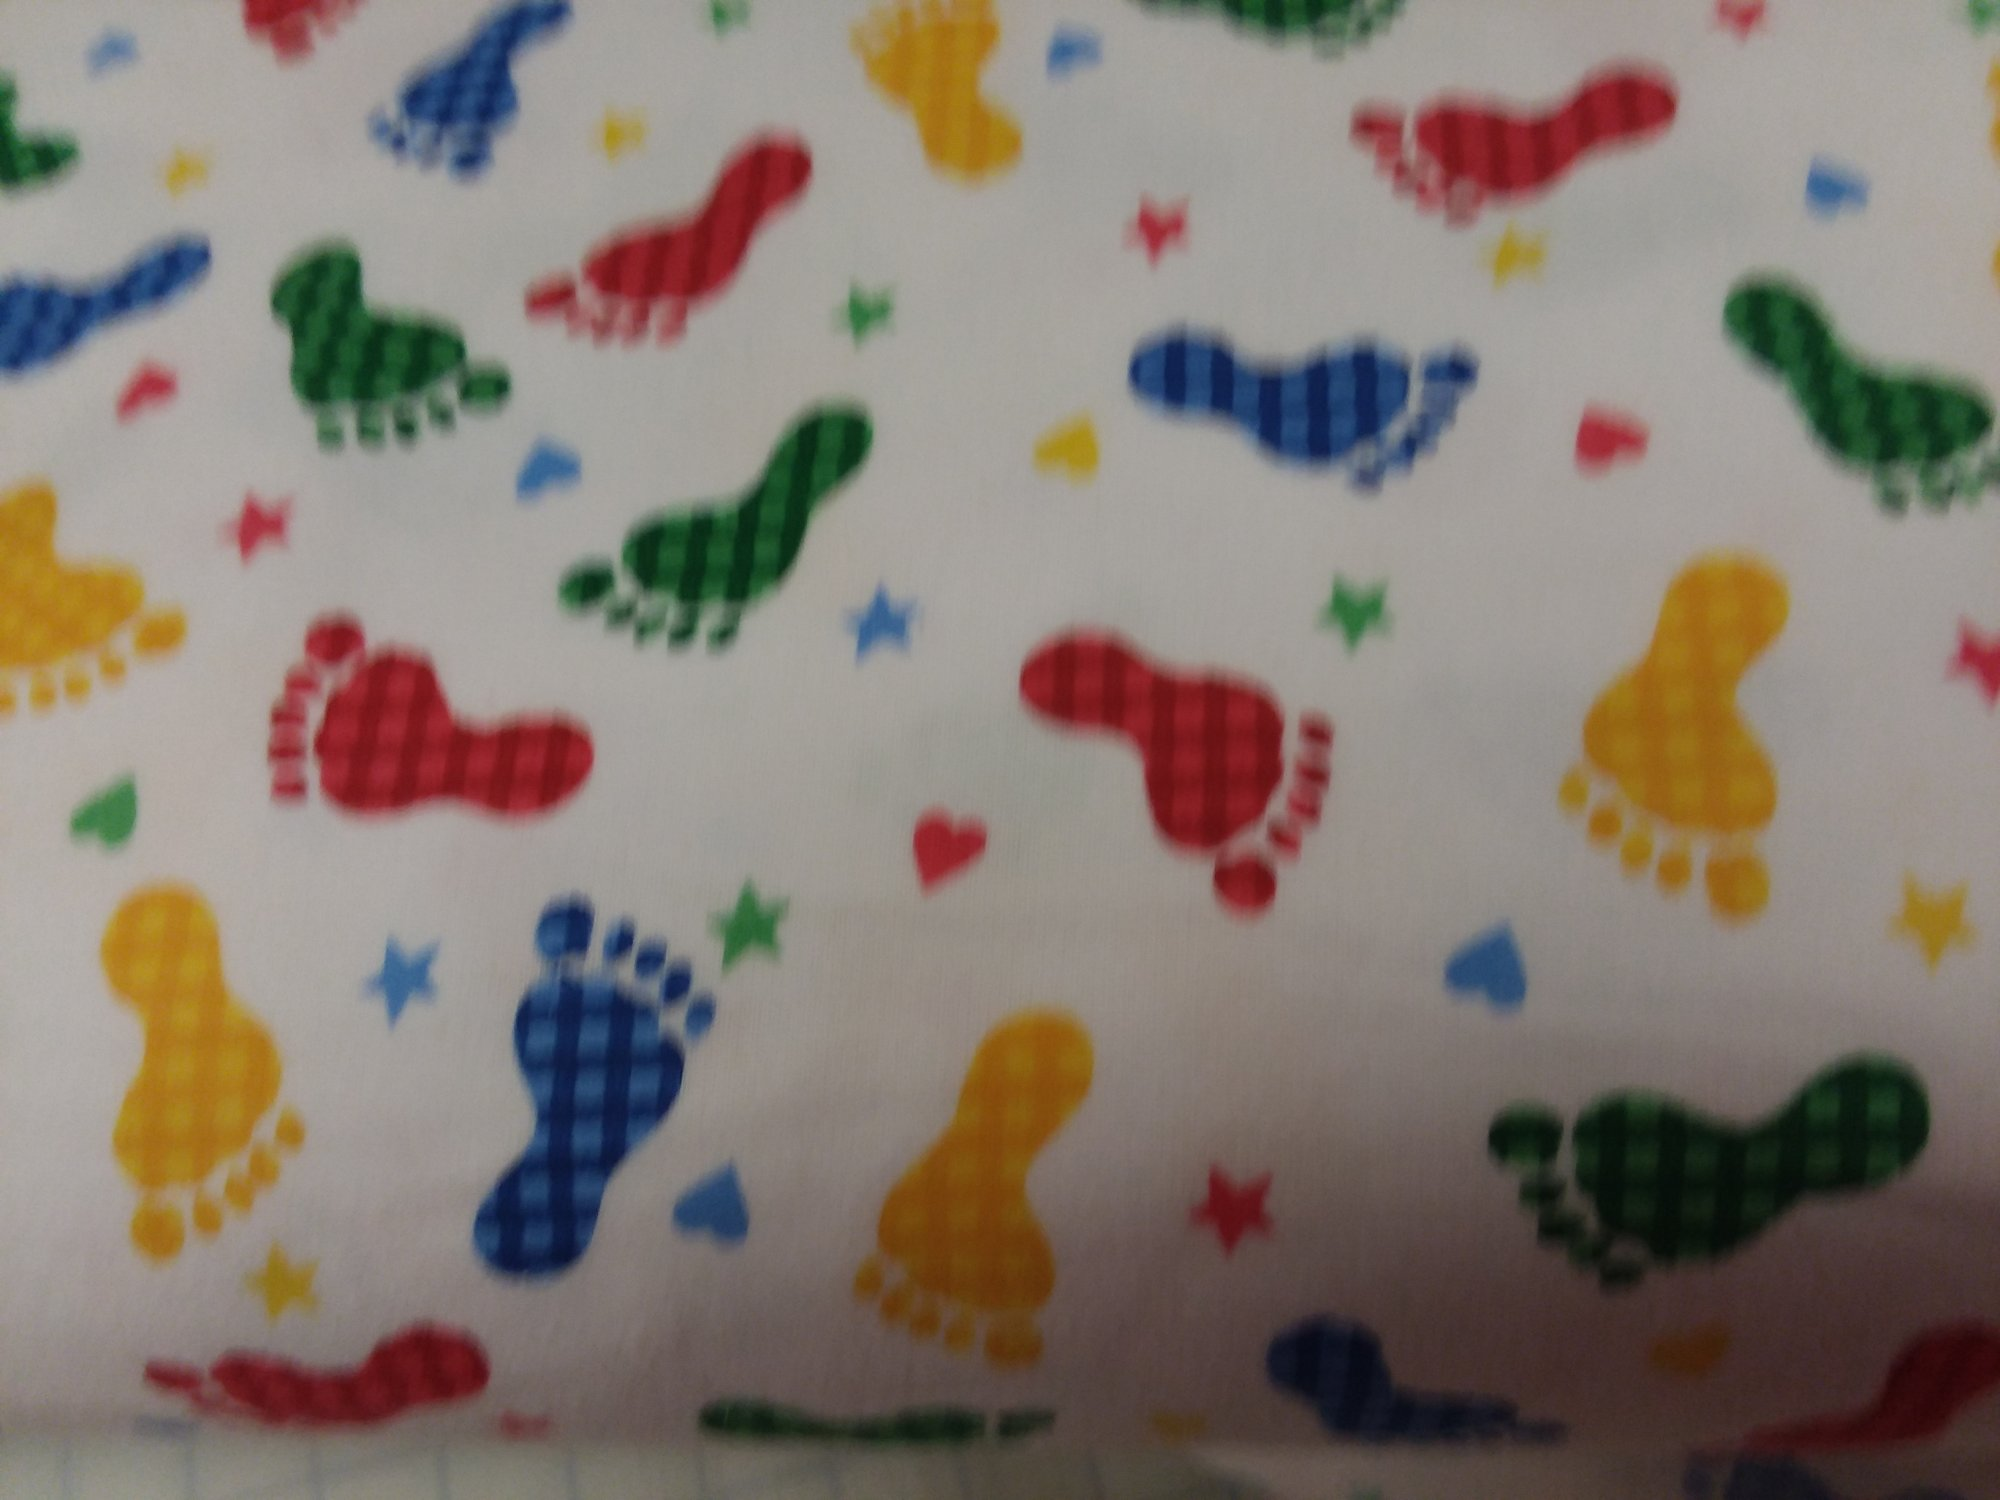 Comfy Prints Flannel - Primary Colors footprints